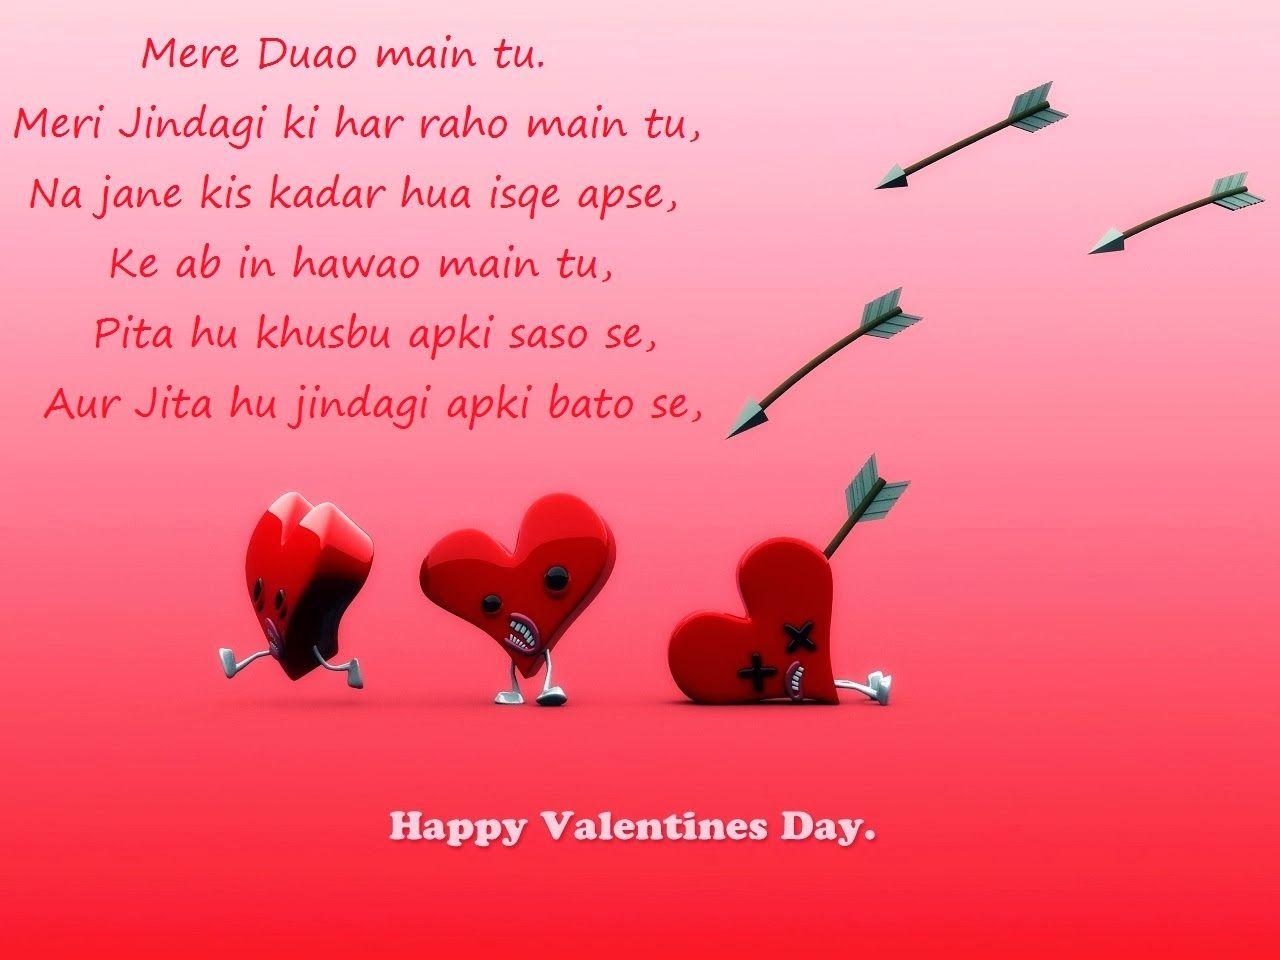 hindi valentines sms 2017 latest hindi valentines wishes